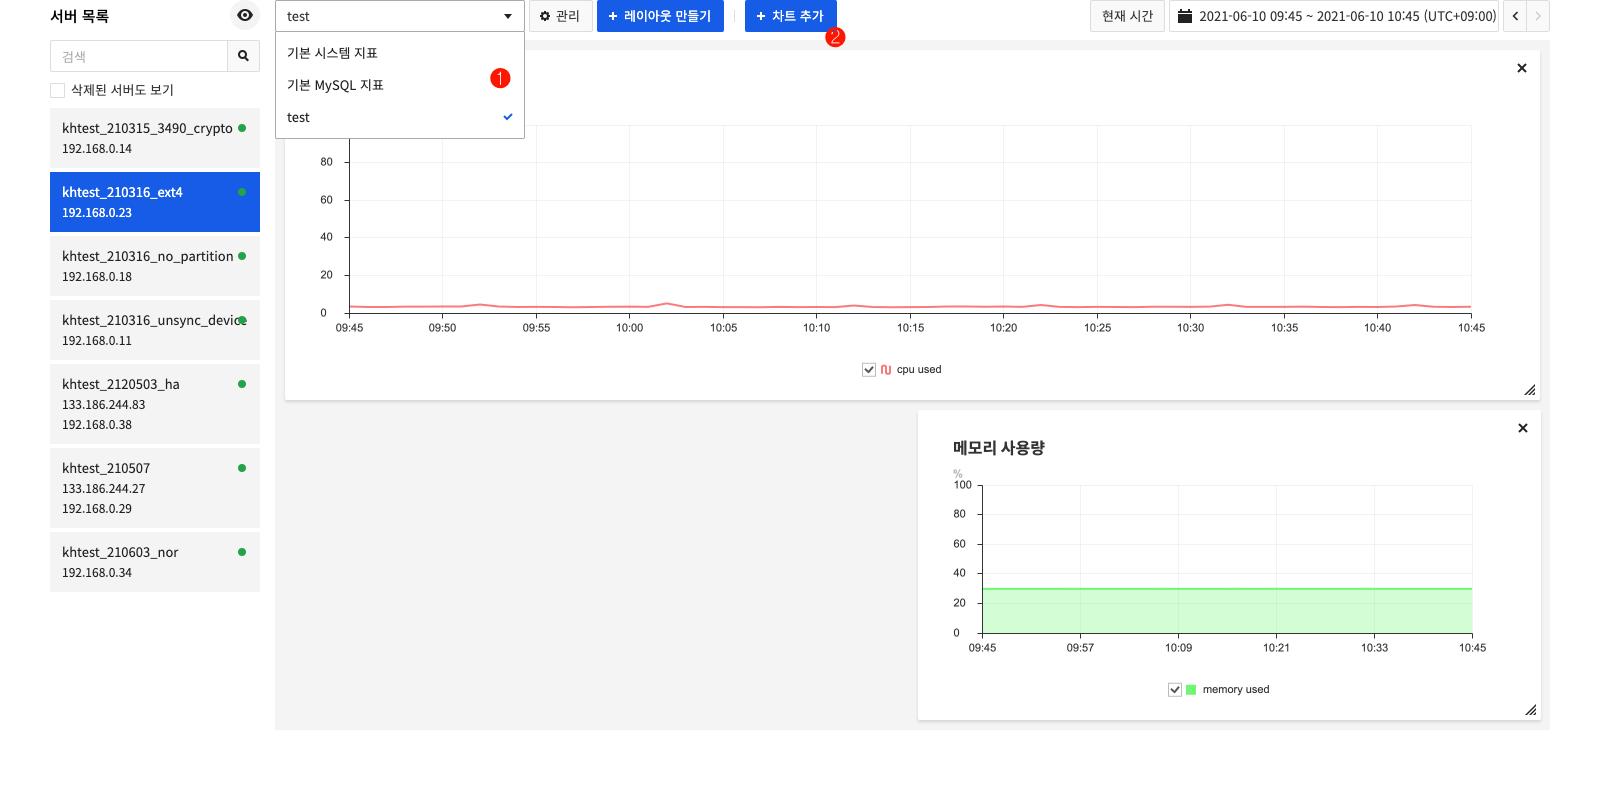 server_dashboard_chart_add_1_ko